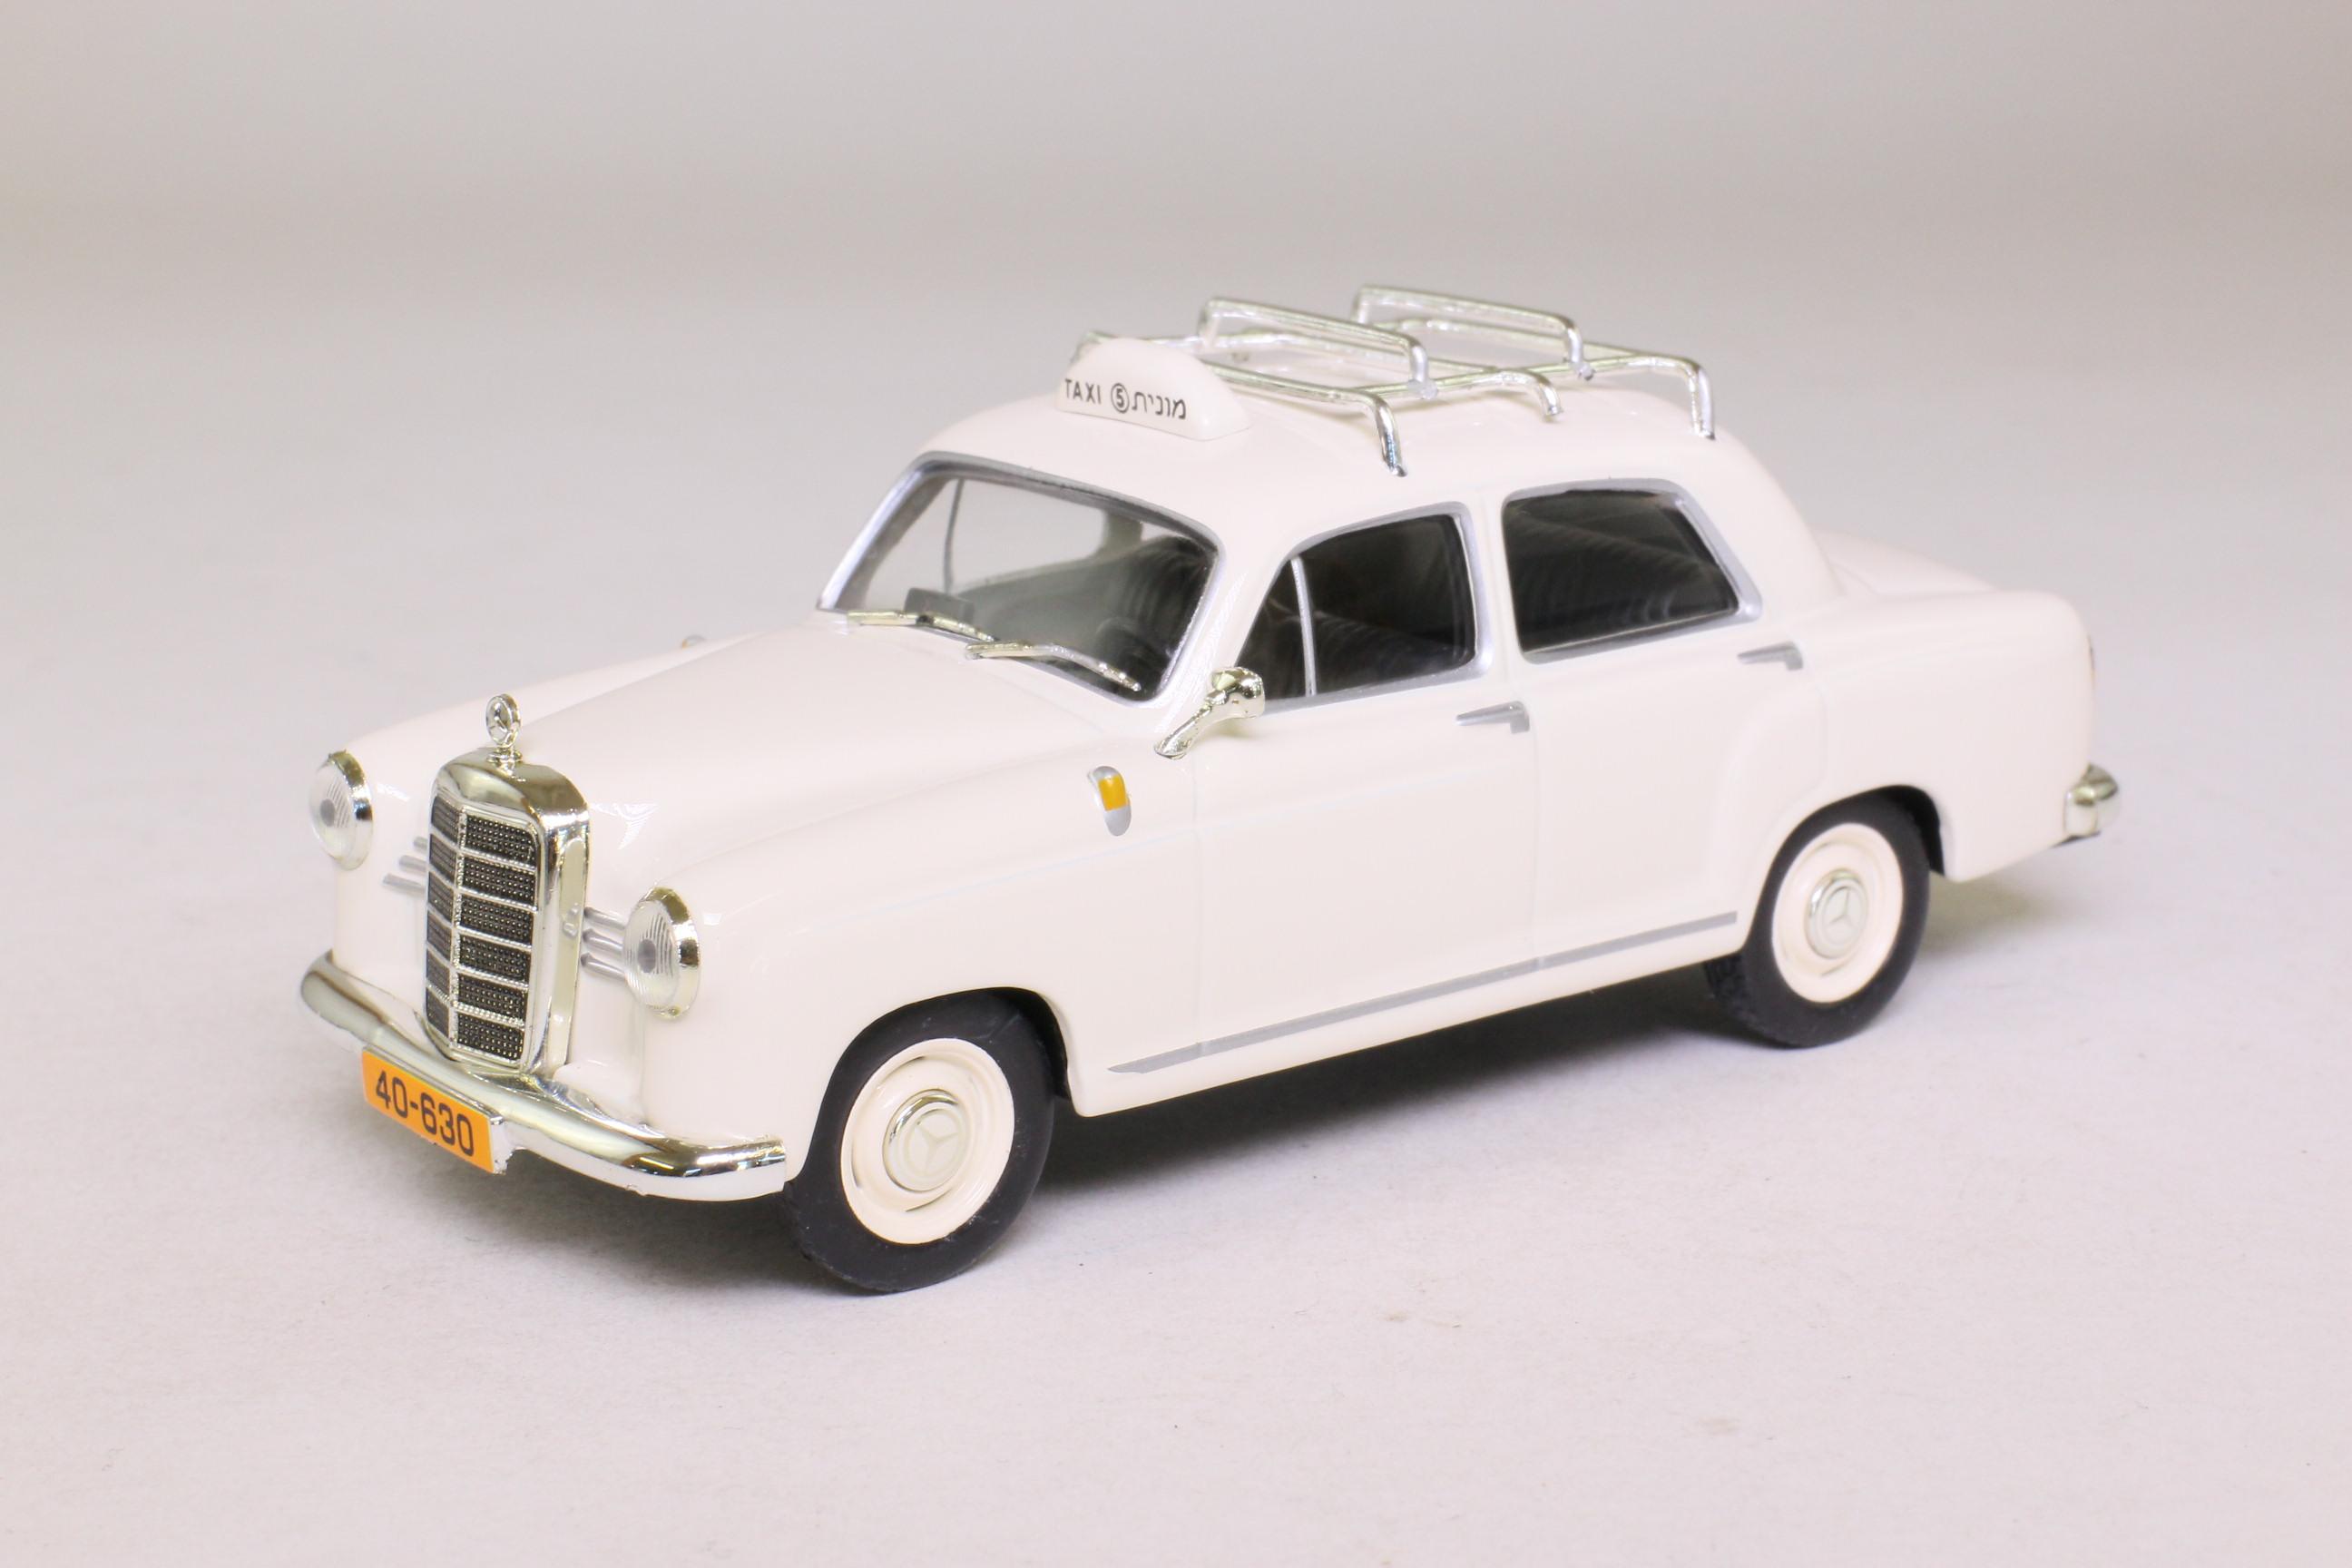 Altaya mercedes benz 180d tel aviv taxi 1962 excellent for Mercedes benz 180d for sale